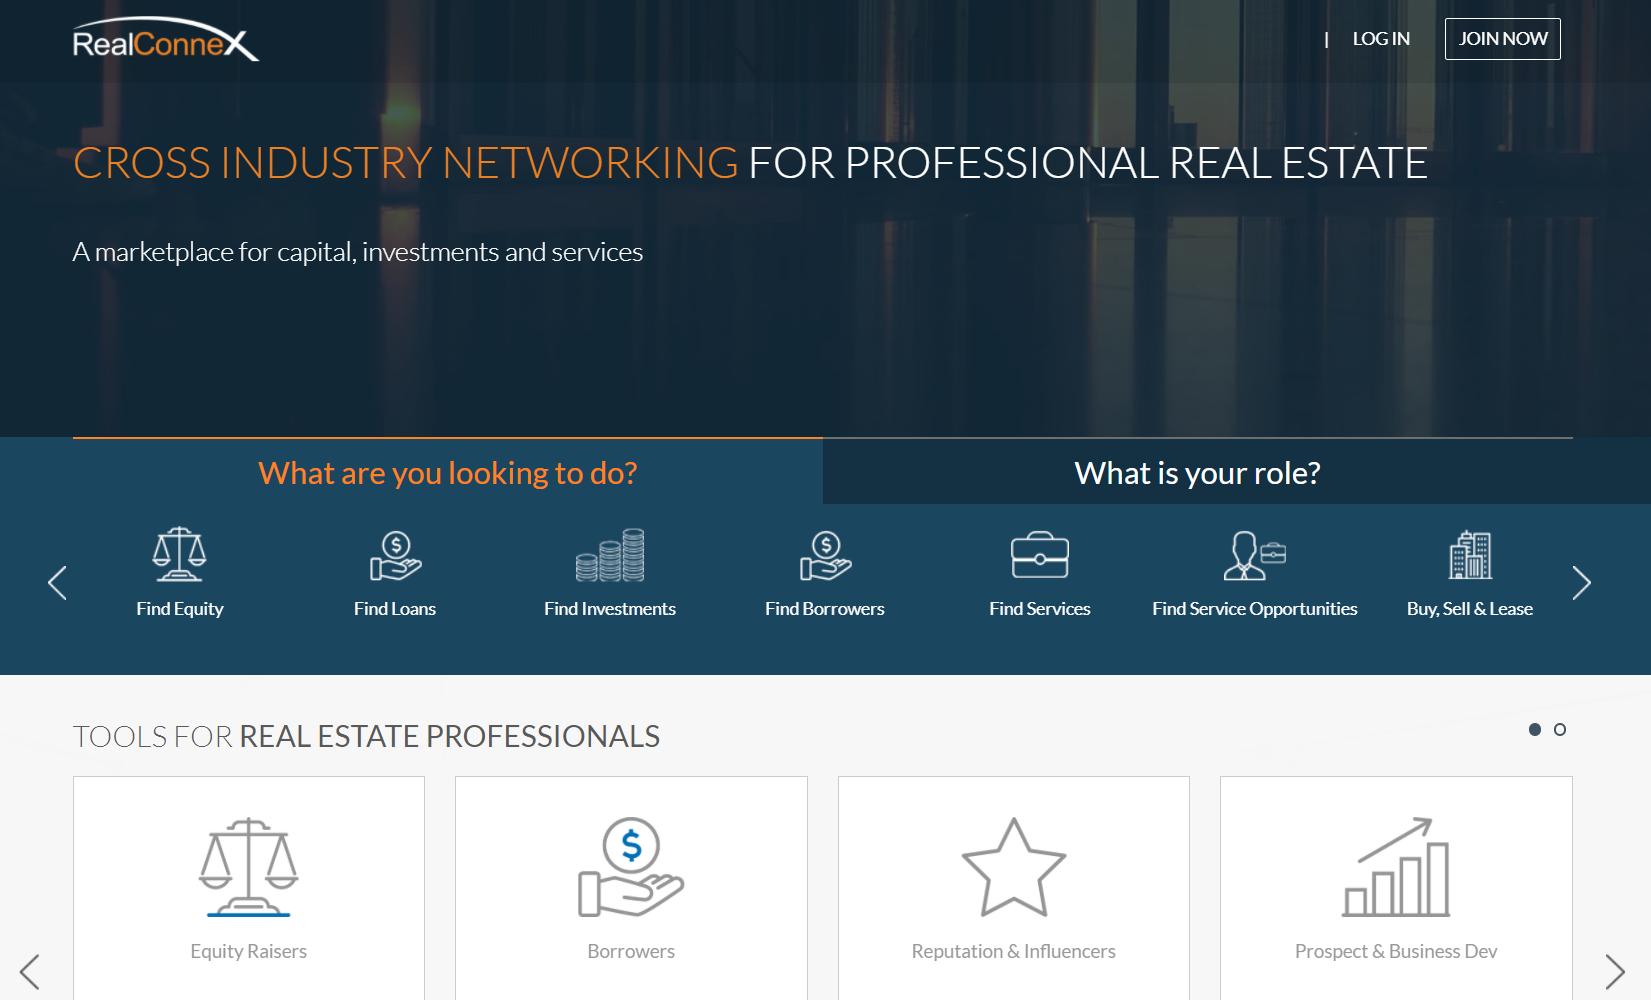 Screenshot of the realeconnex website